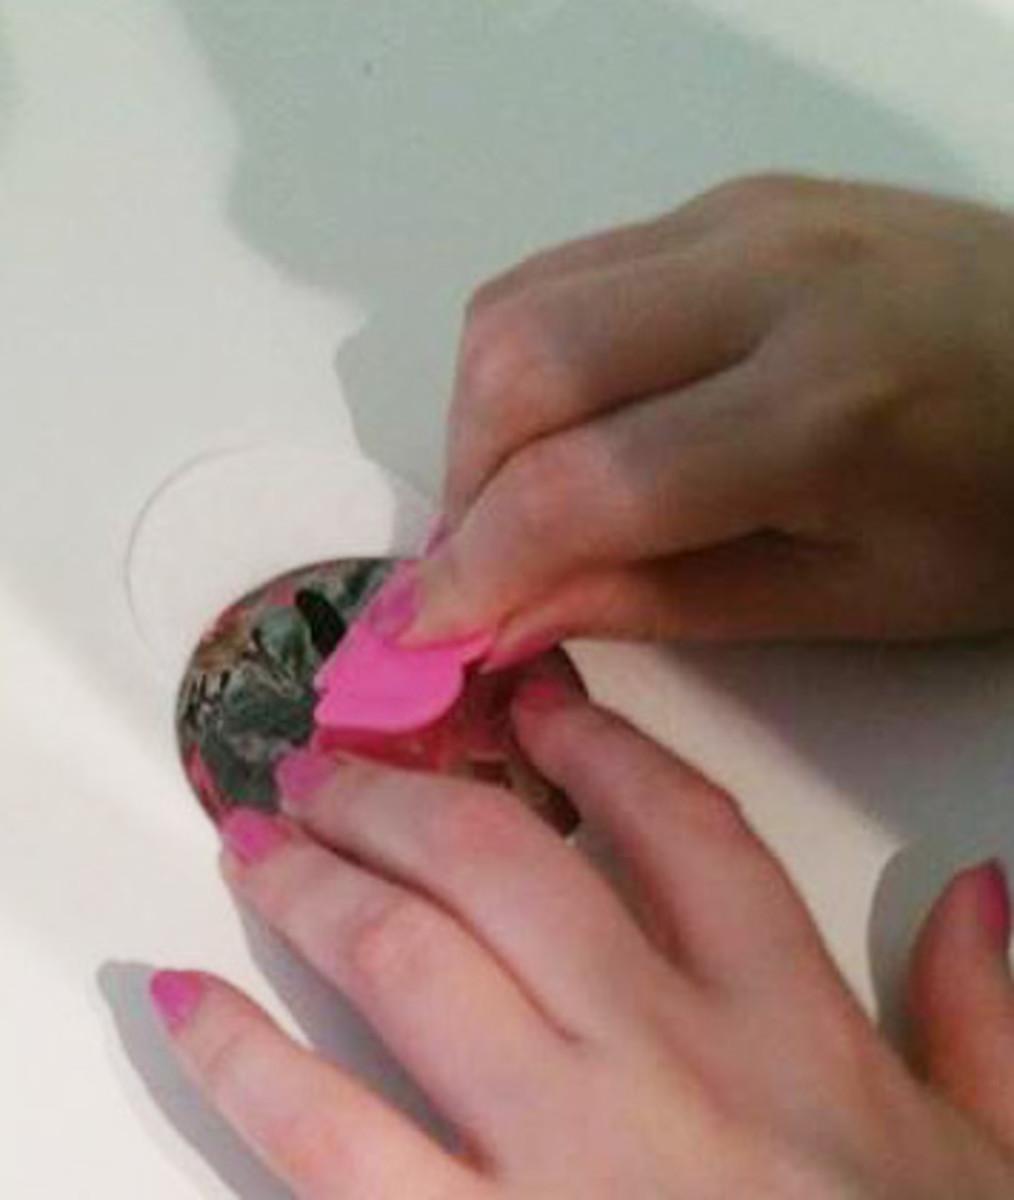 Scrape off excess nail polish...